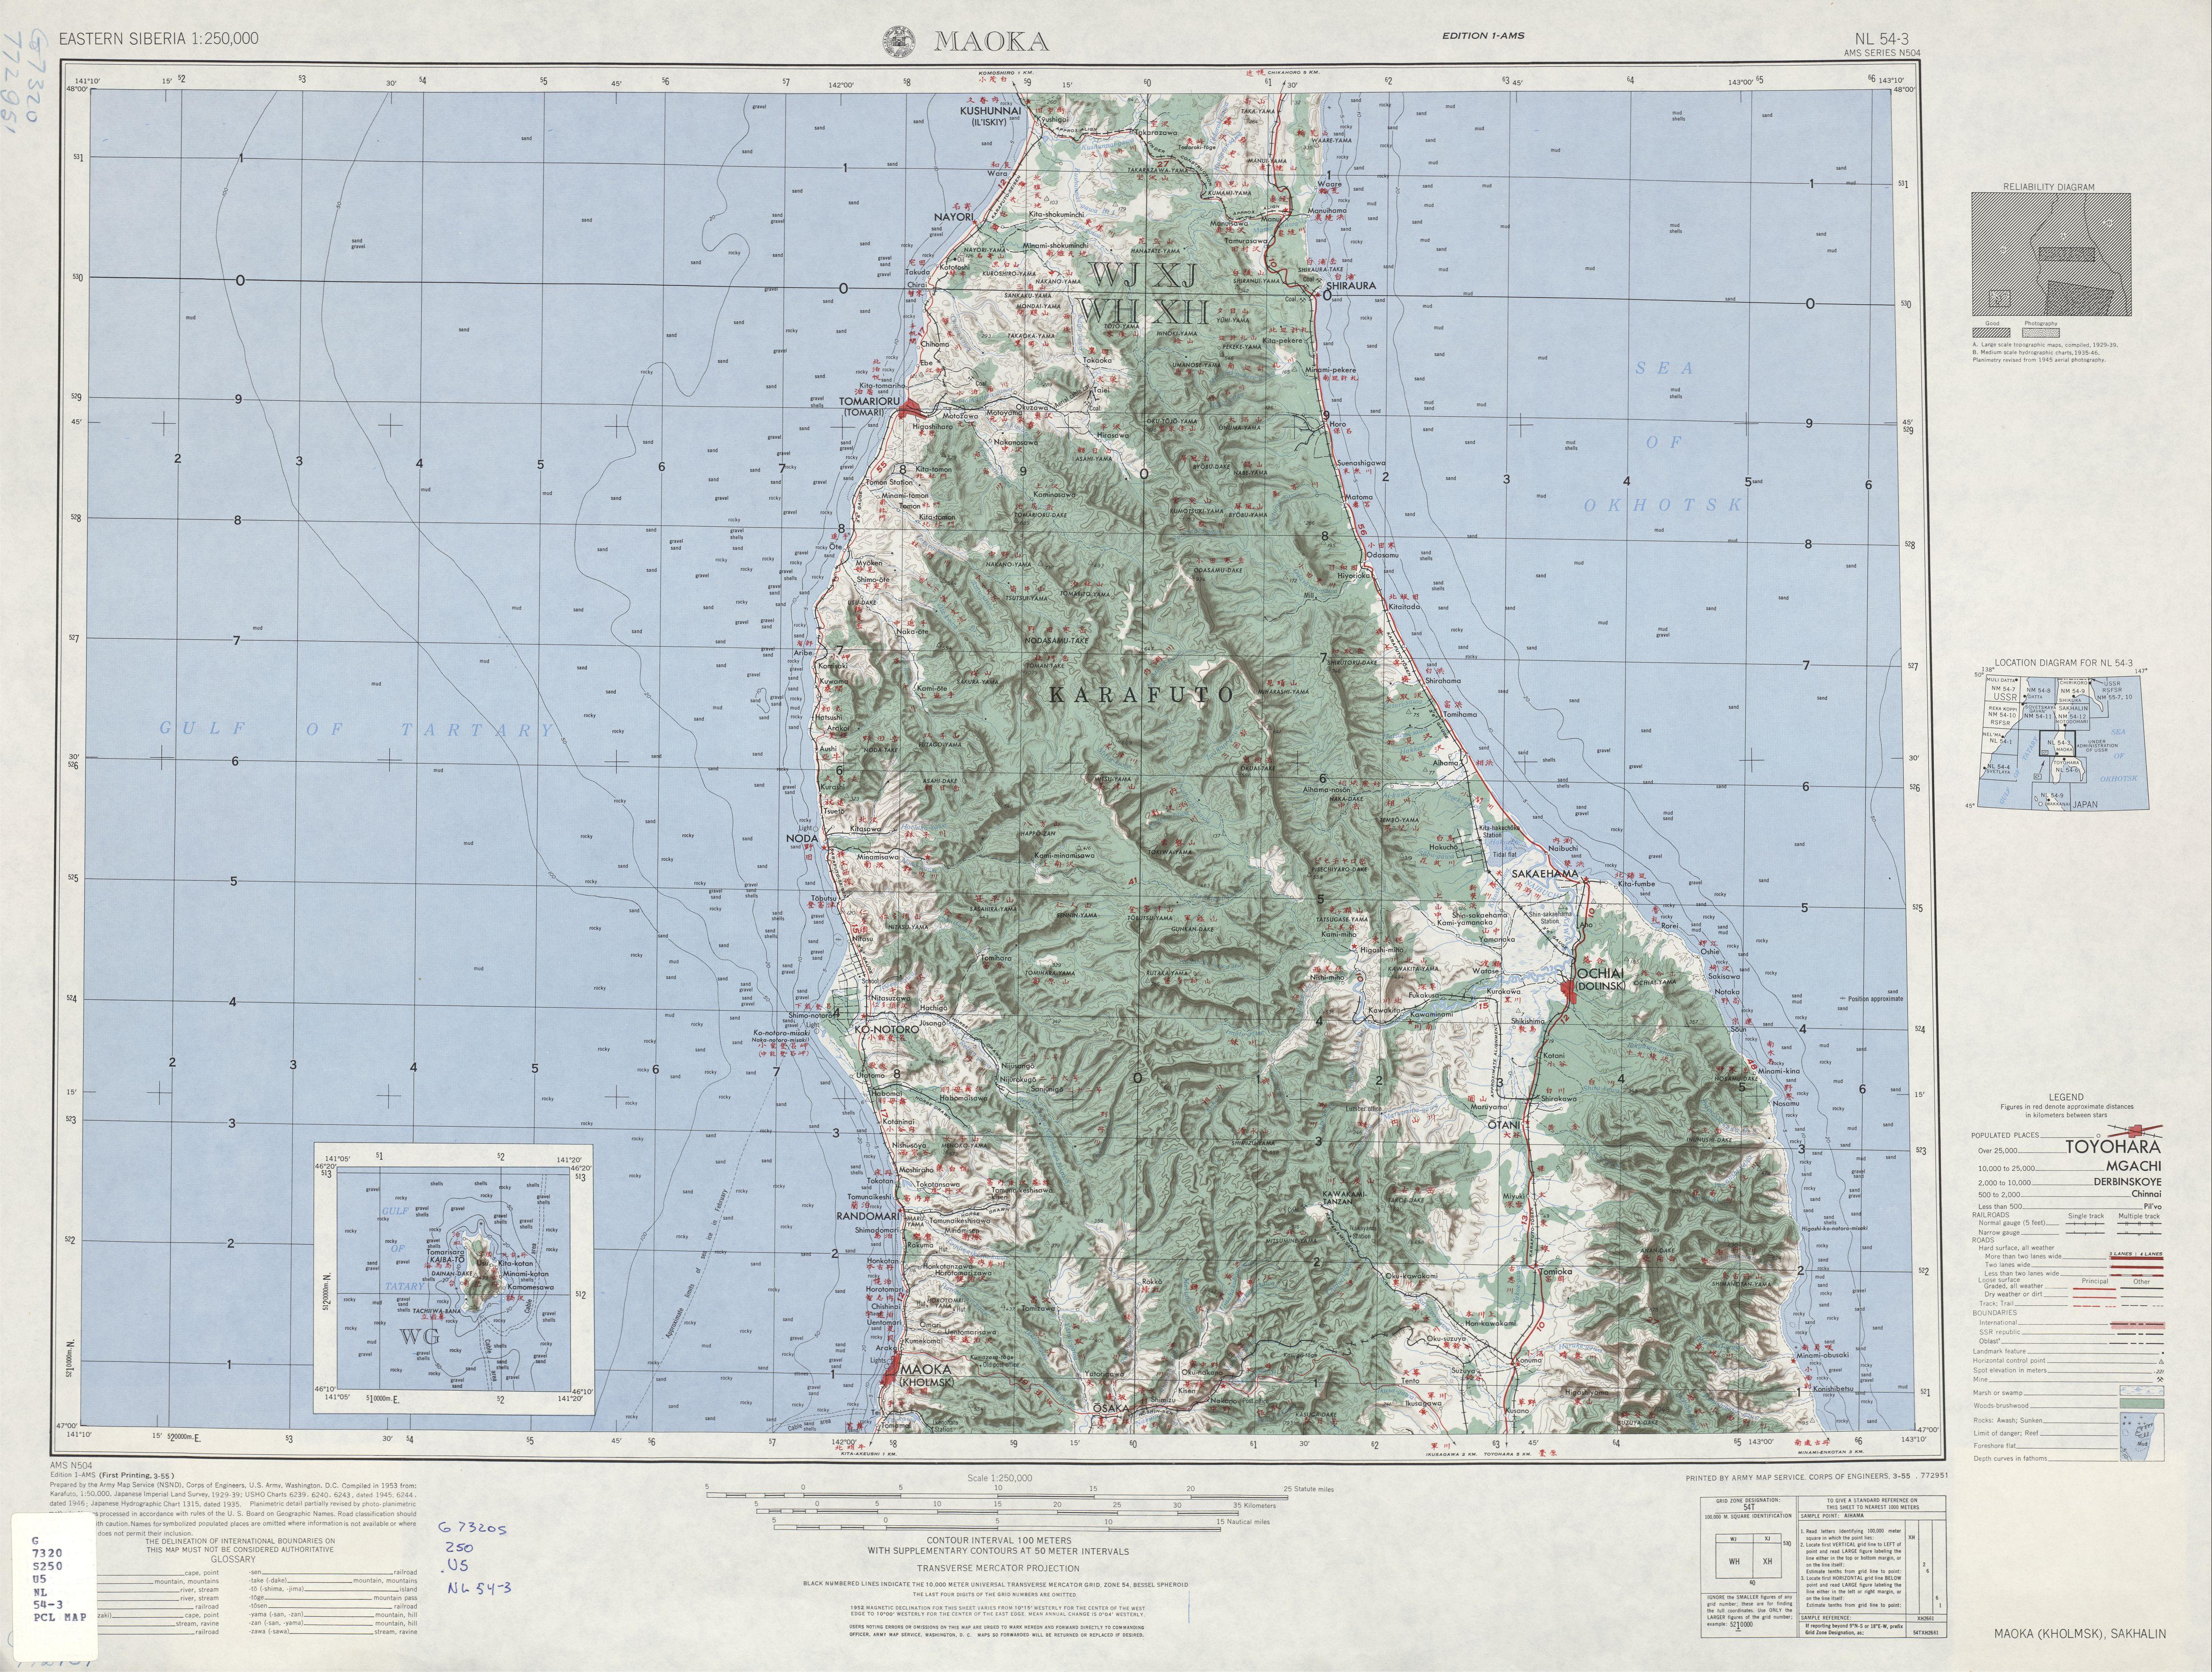 FileUSSR map NL 54 3 Maokajpg FileUSSR map